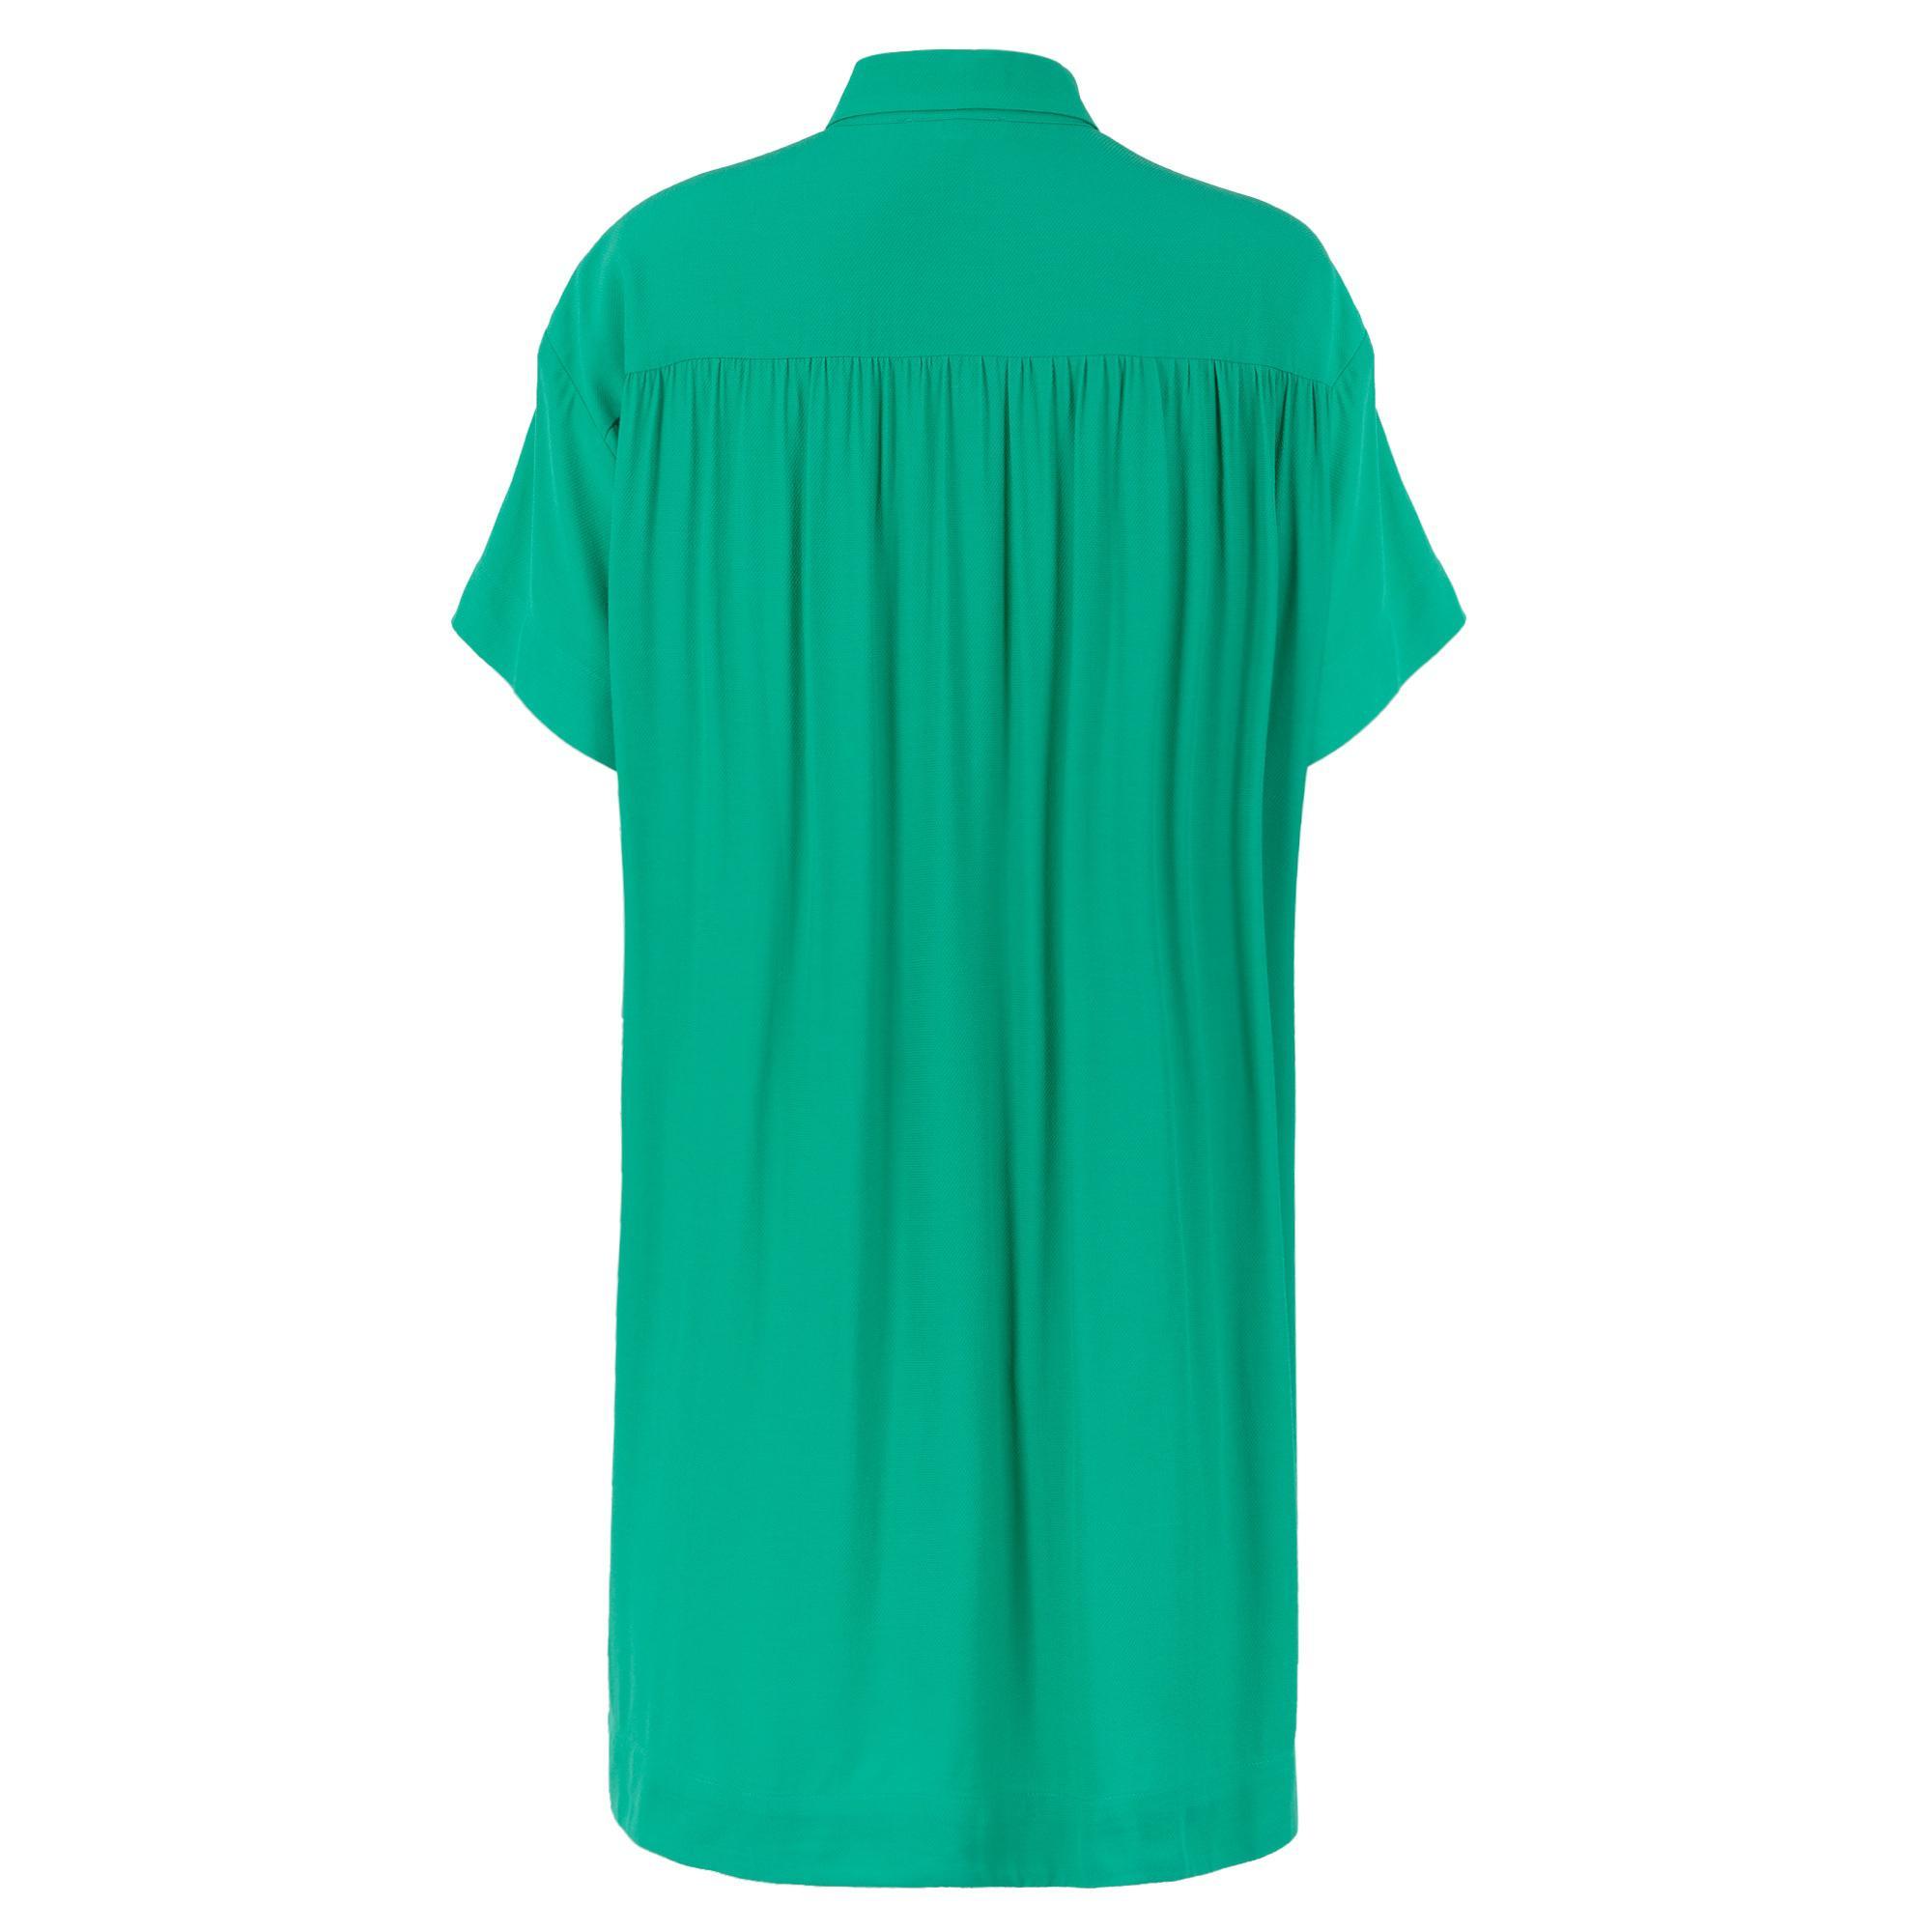 9440edc8df Oliver Bonas Life Green Shirt Dress in Green - Lyst